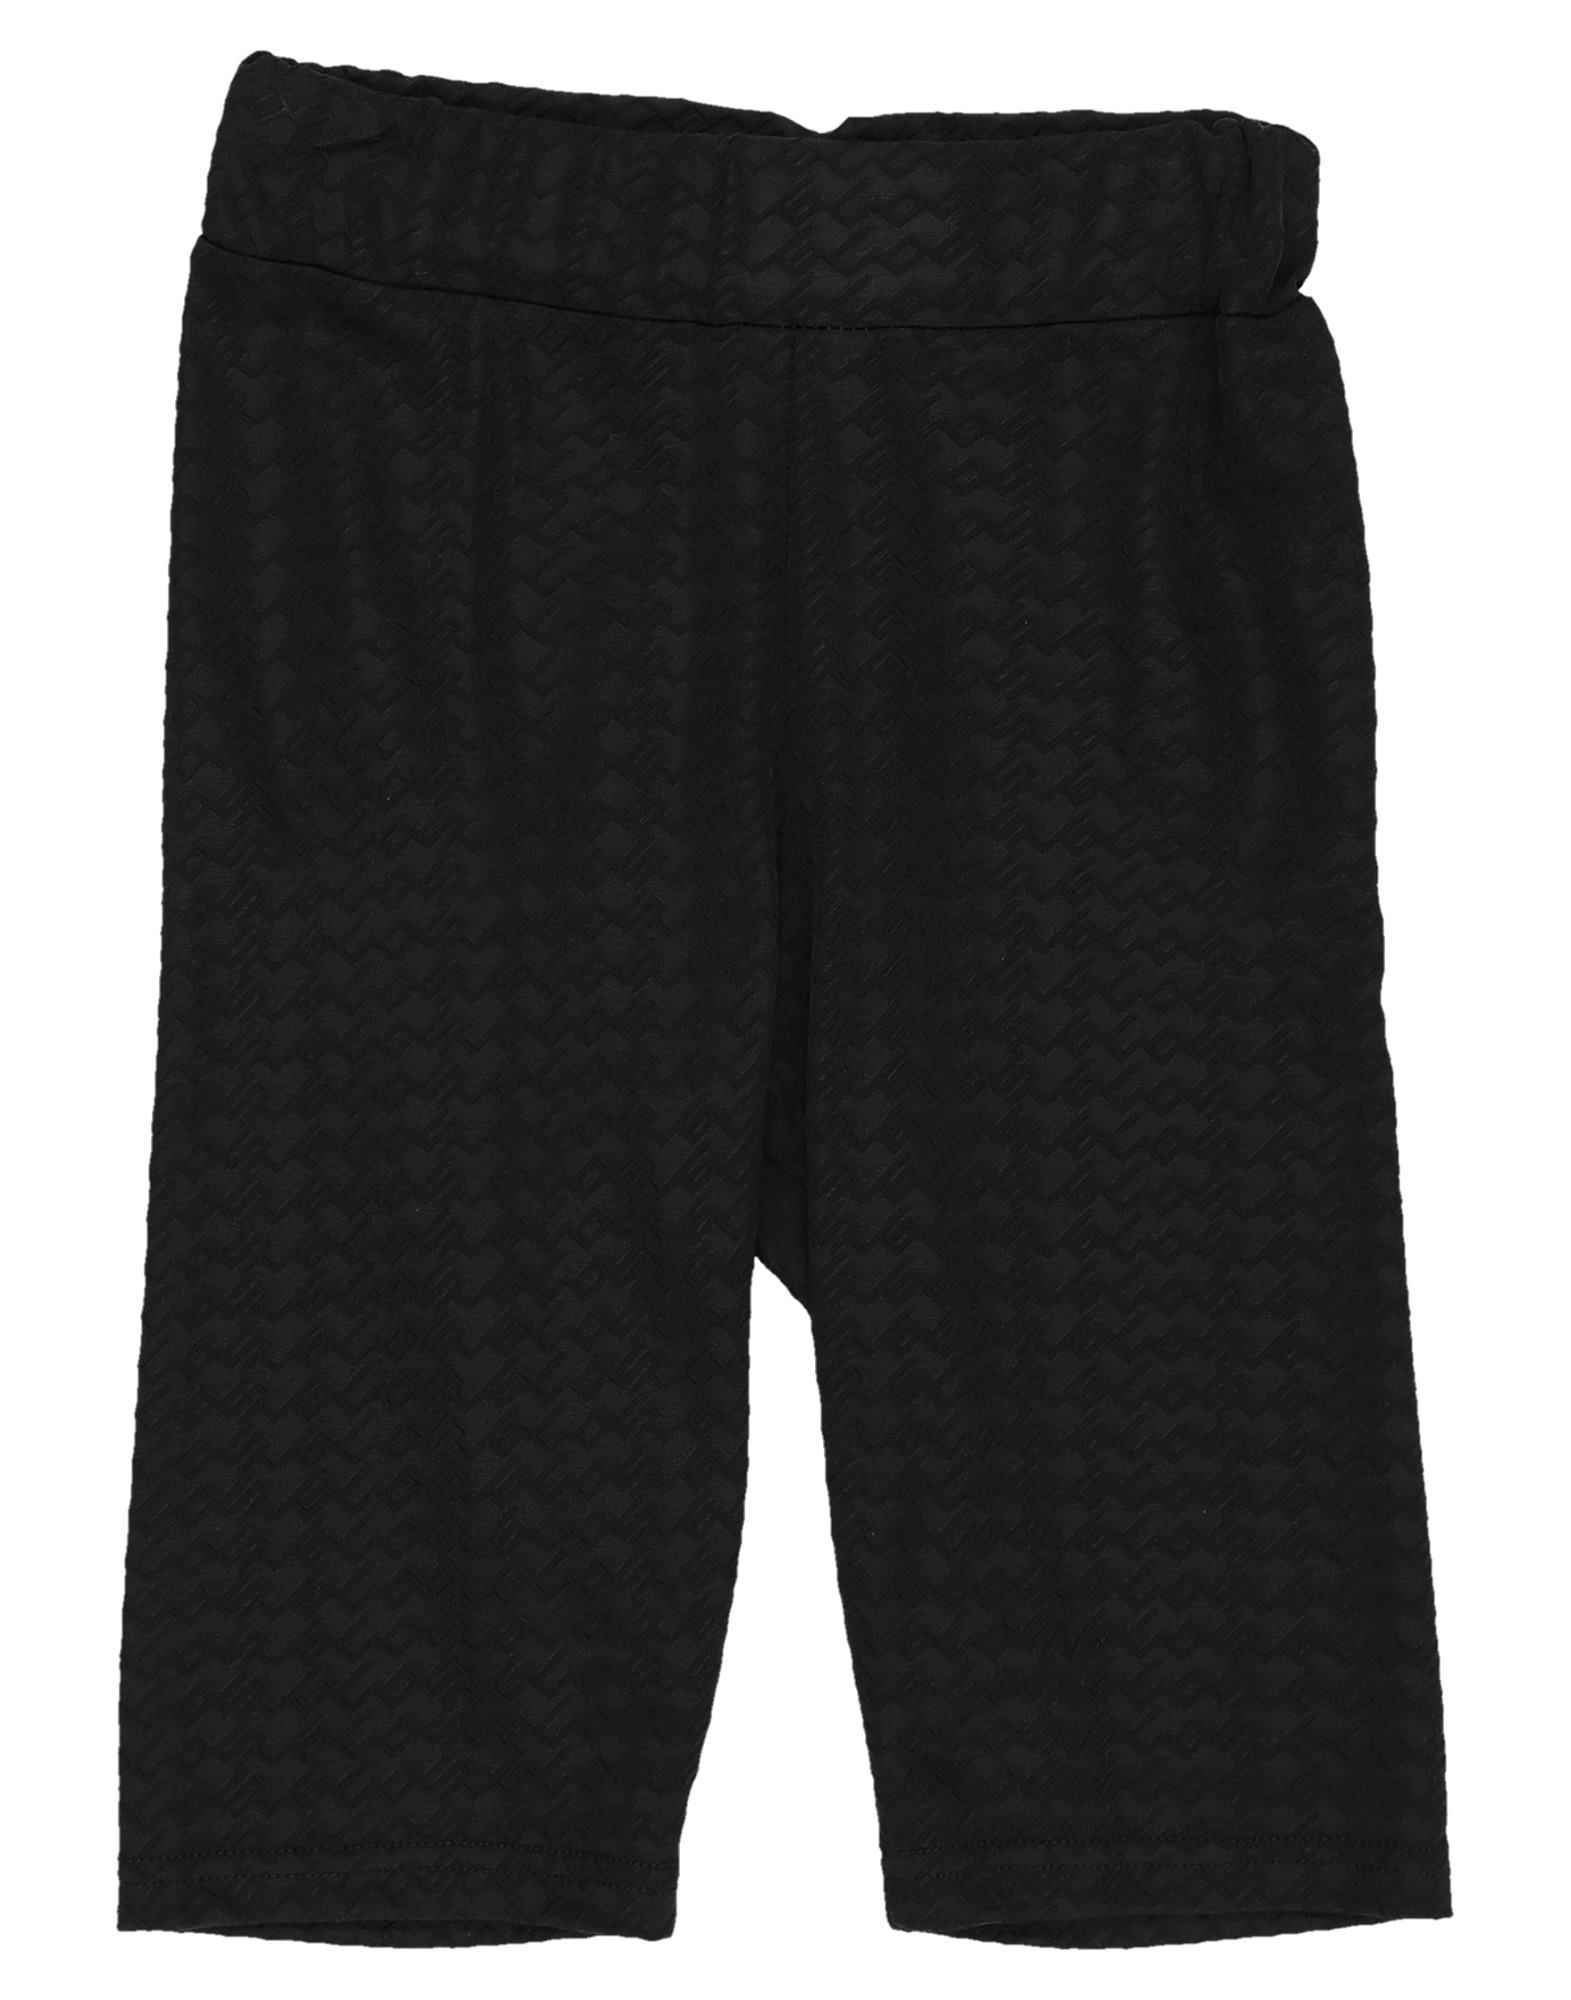 GCDS Bermudas. jersey, no appliqués, solid color, high waisted, comfort fit, elasticized waist, no pockets, stretch. 68% Viscose, 27% Polyamide, 5% Elastane